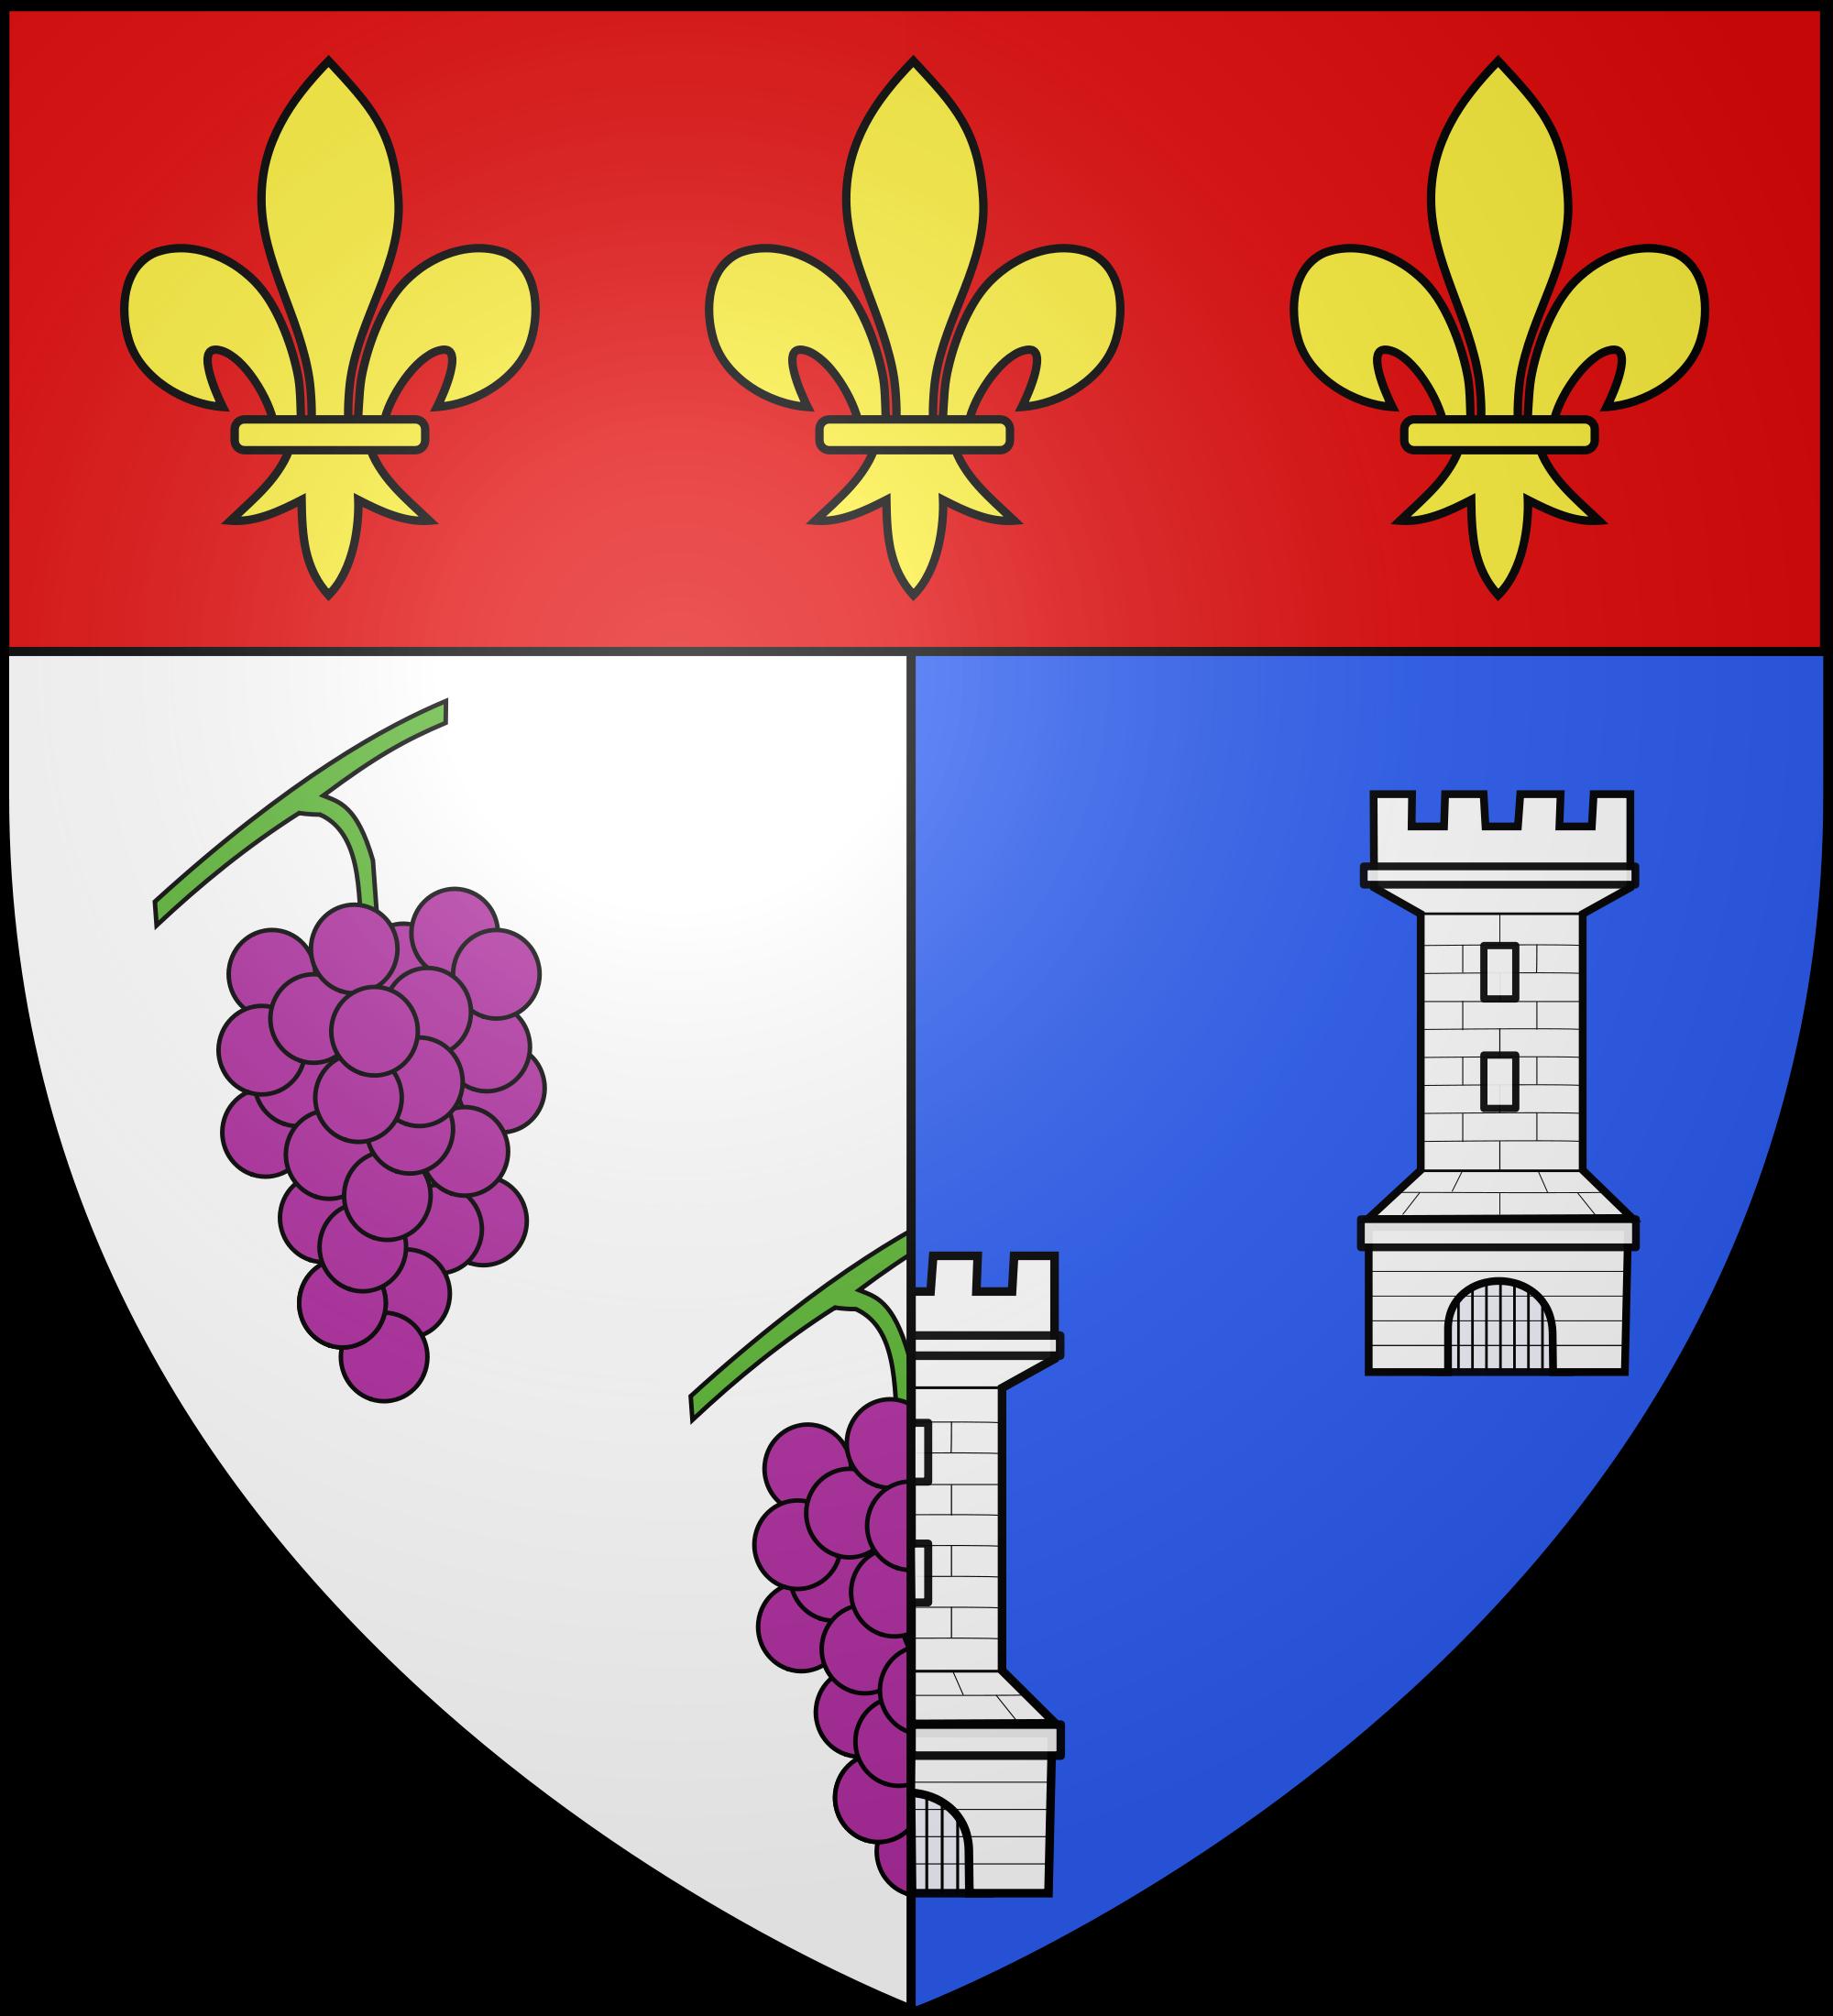 File:Blason ville fr Les Andelys (Eure).svg.